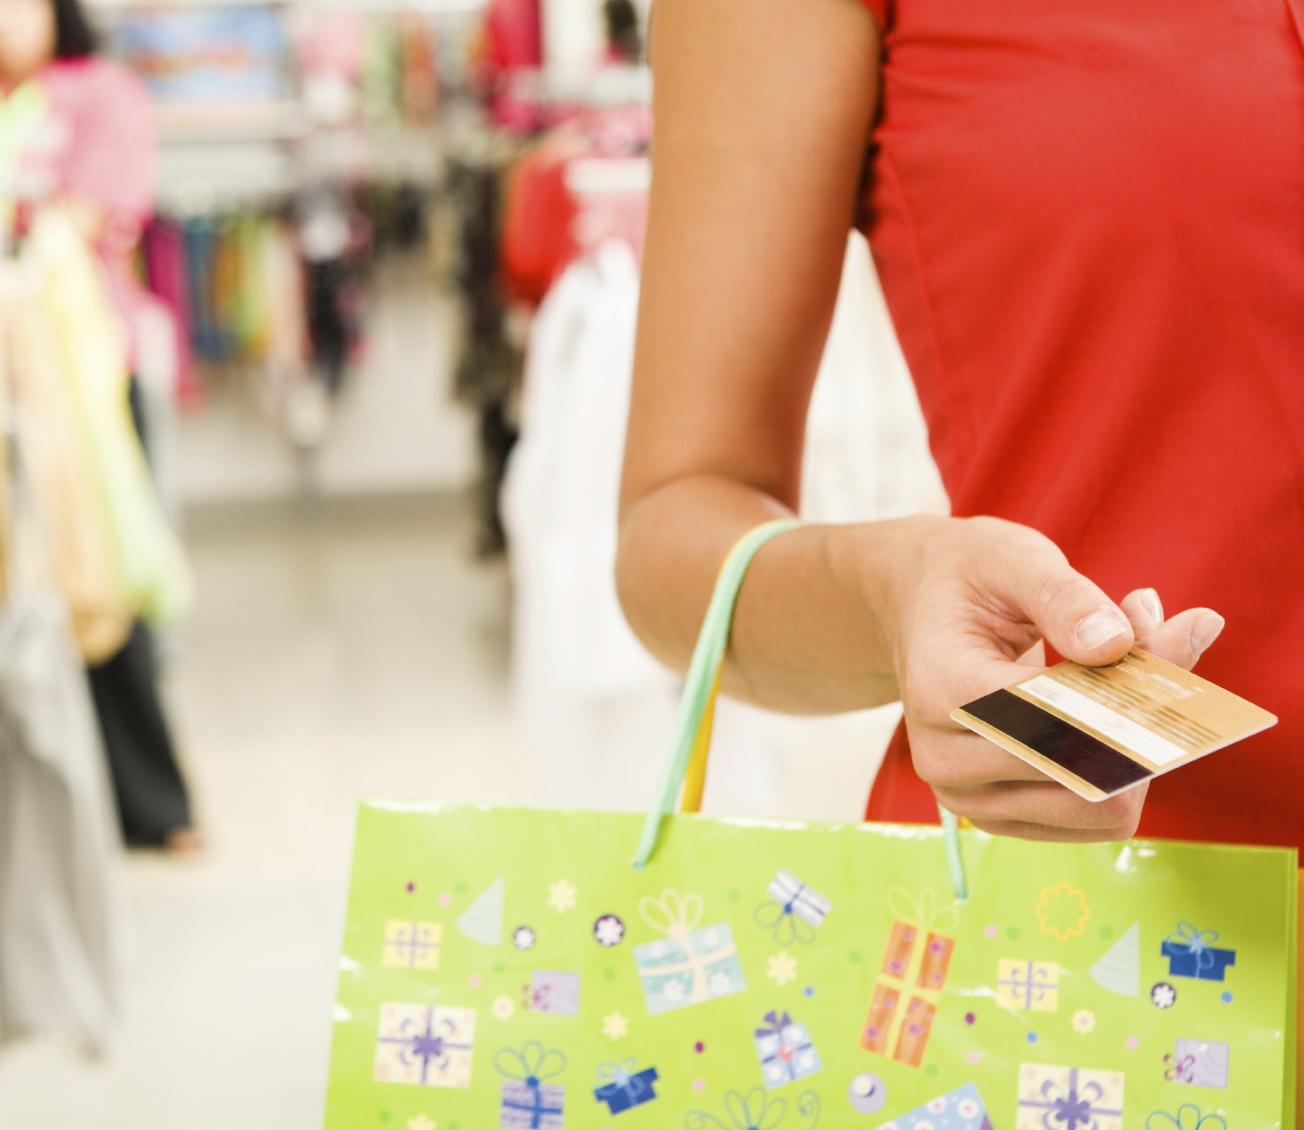 Comertul e in floare: Romania ocupa locul 3 la nivelul Uniunii Europene ca rata de crestere in zona retail